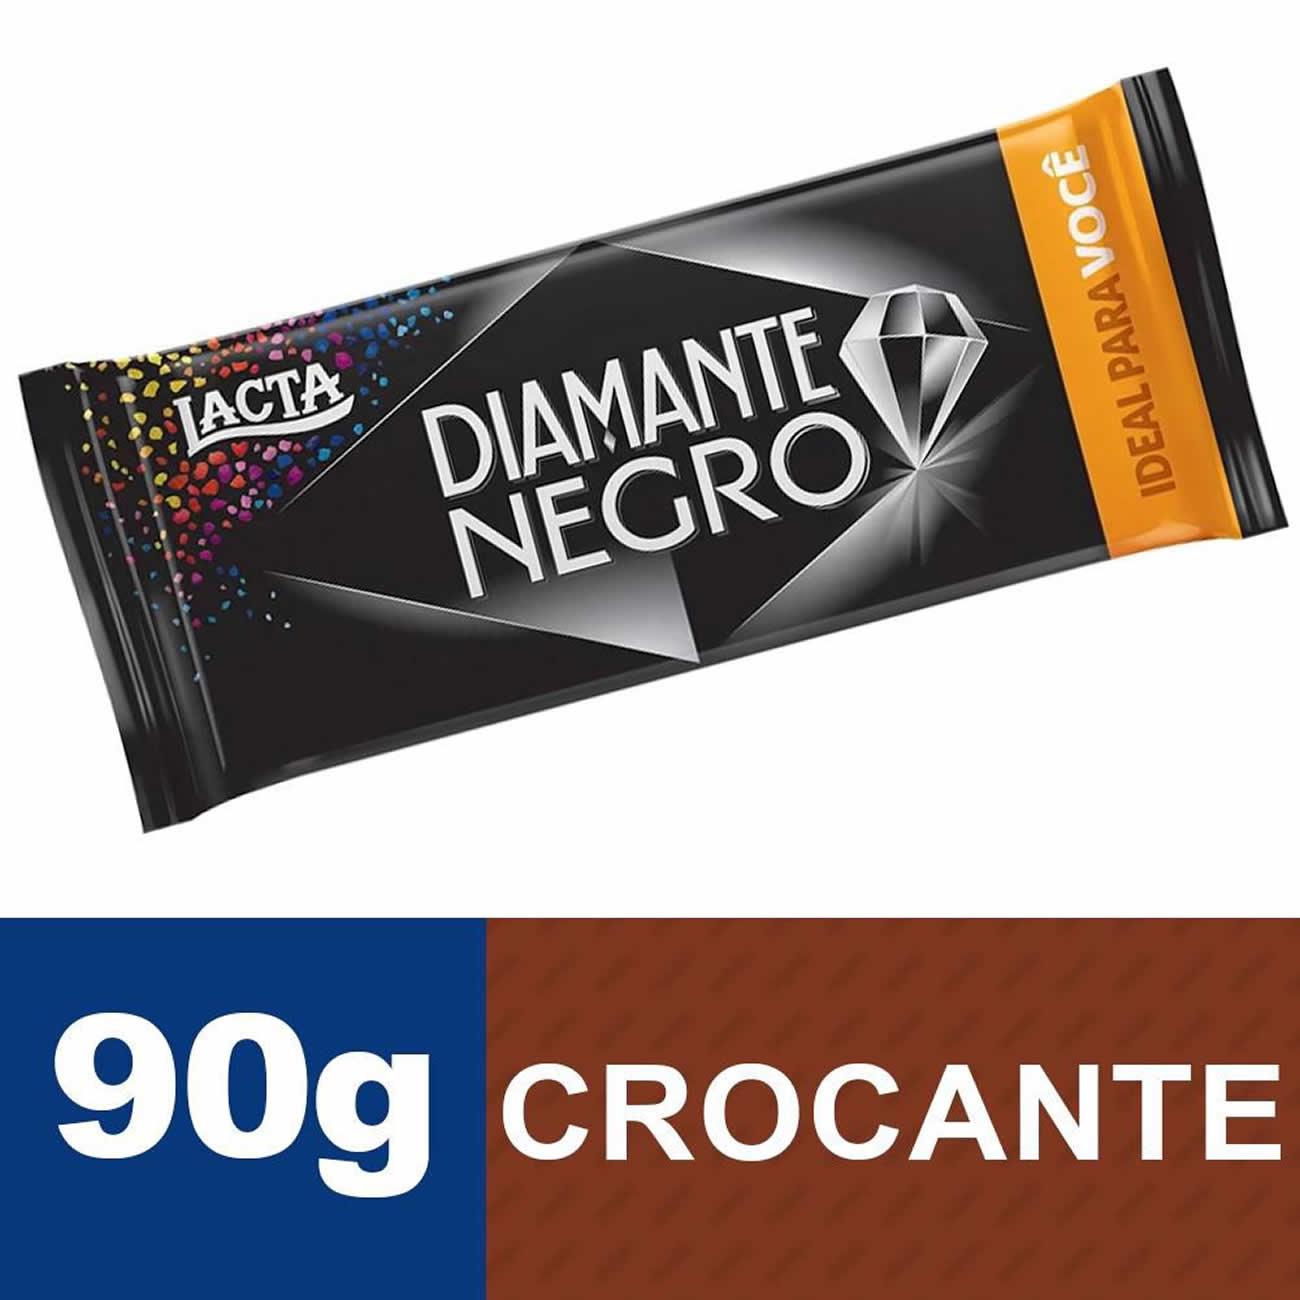 Chocolate Diamante Negro 90g